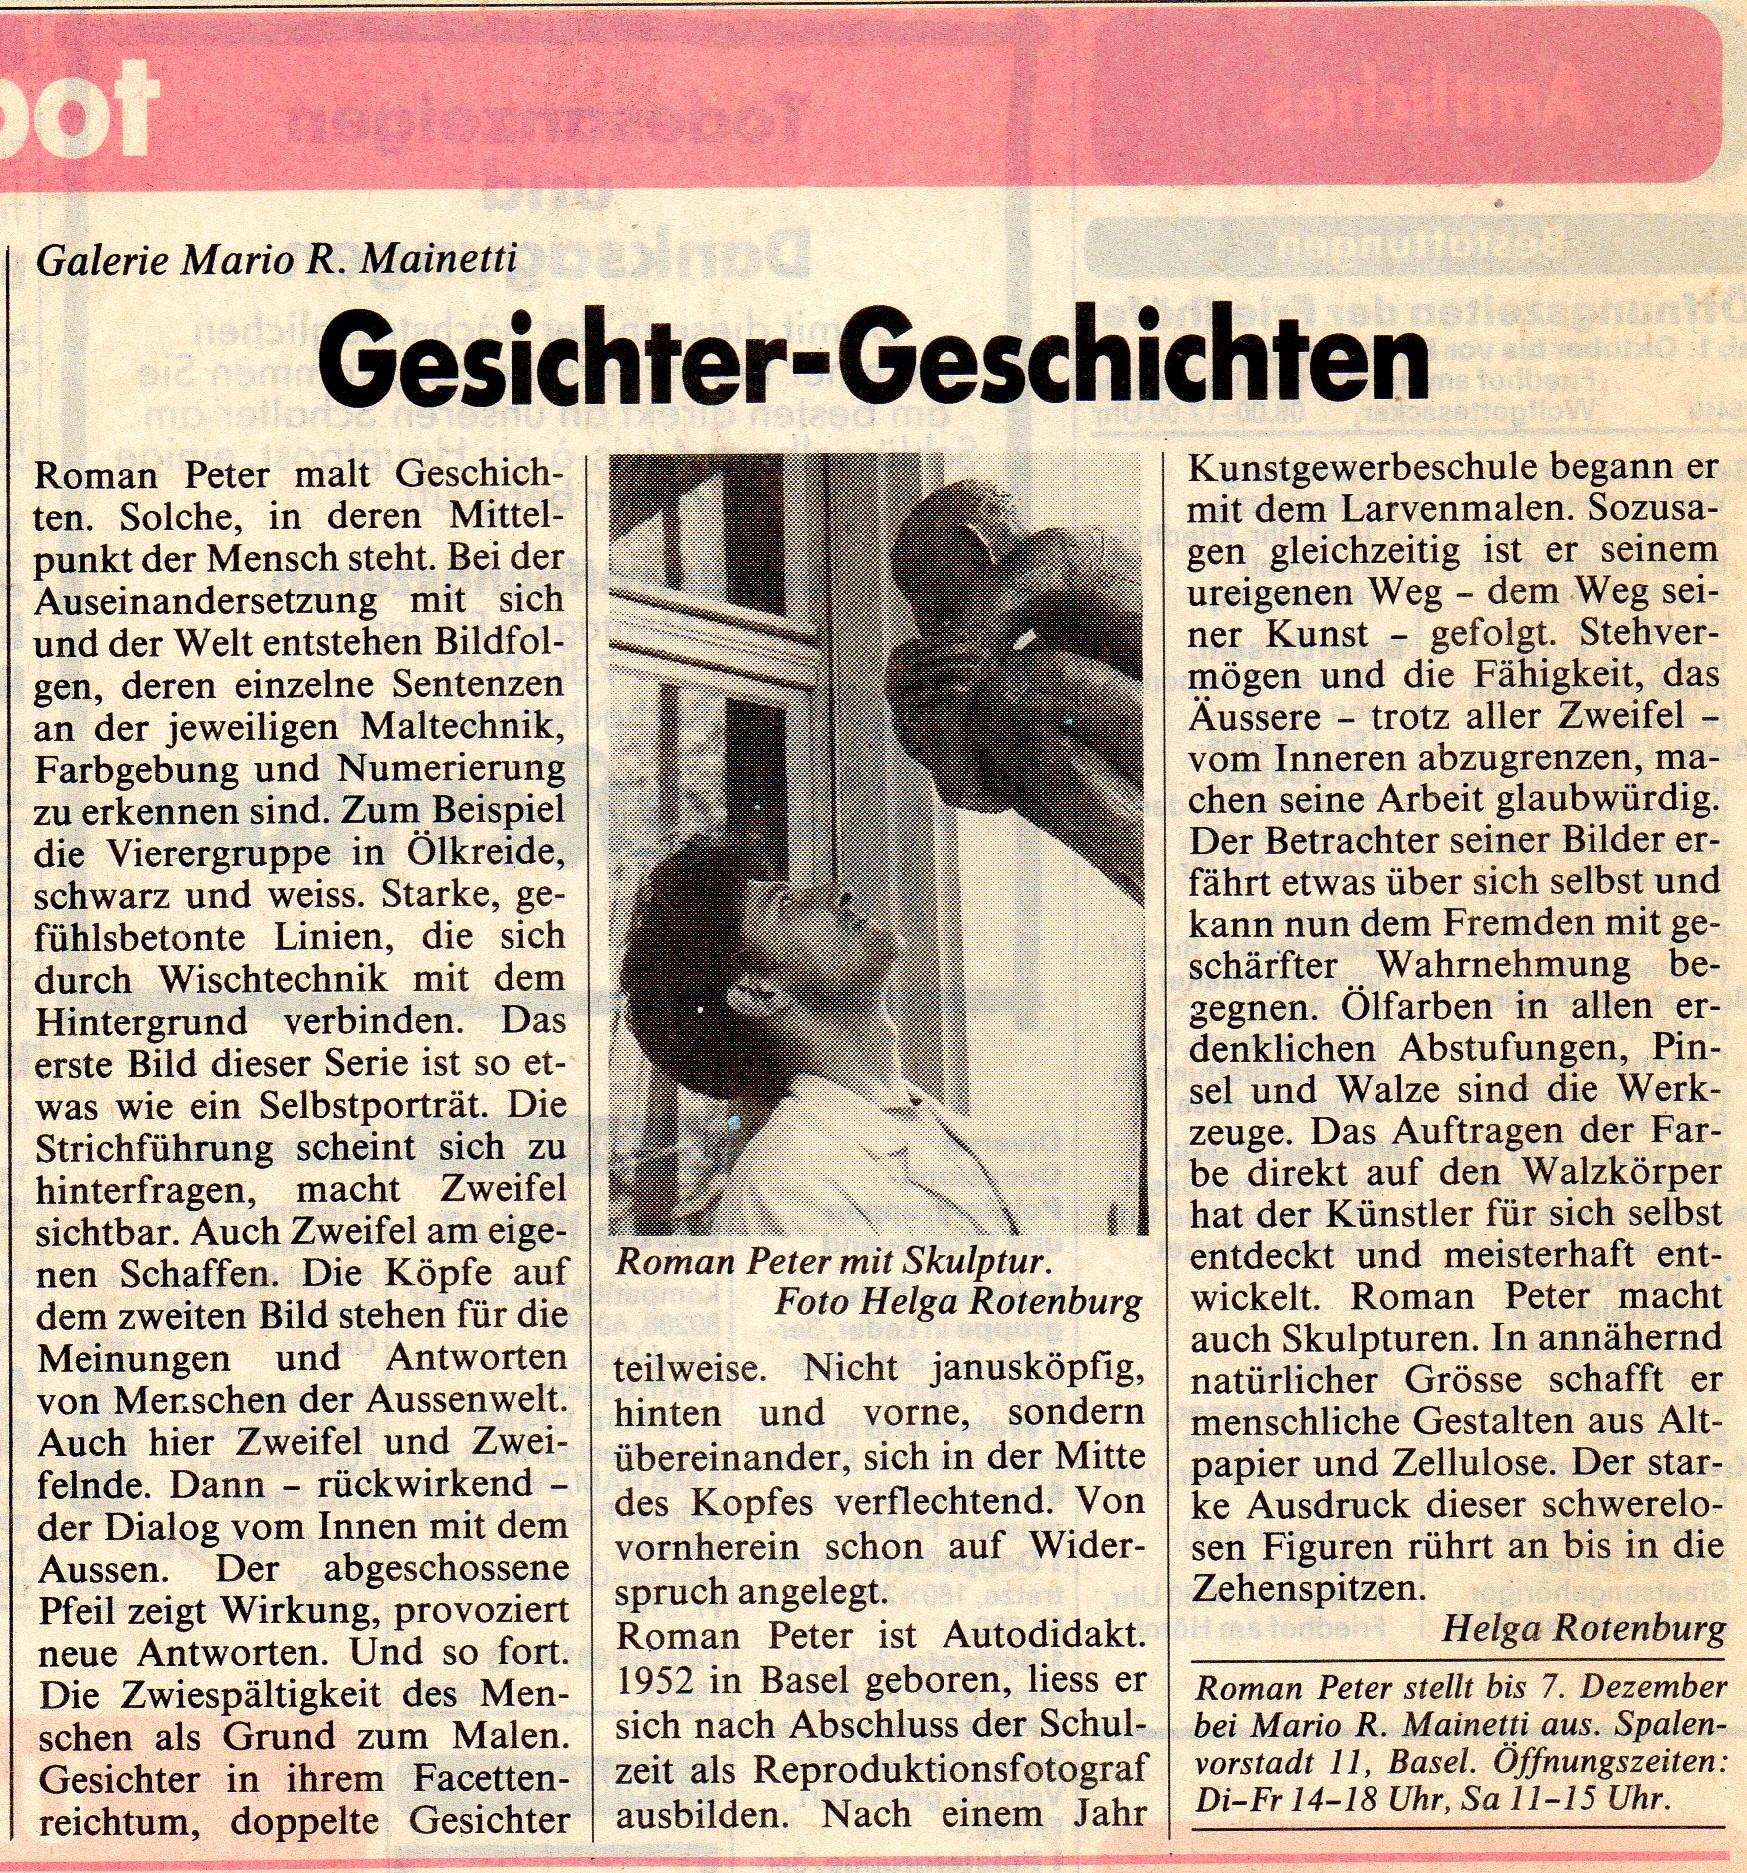 1989, Baslerstab